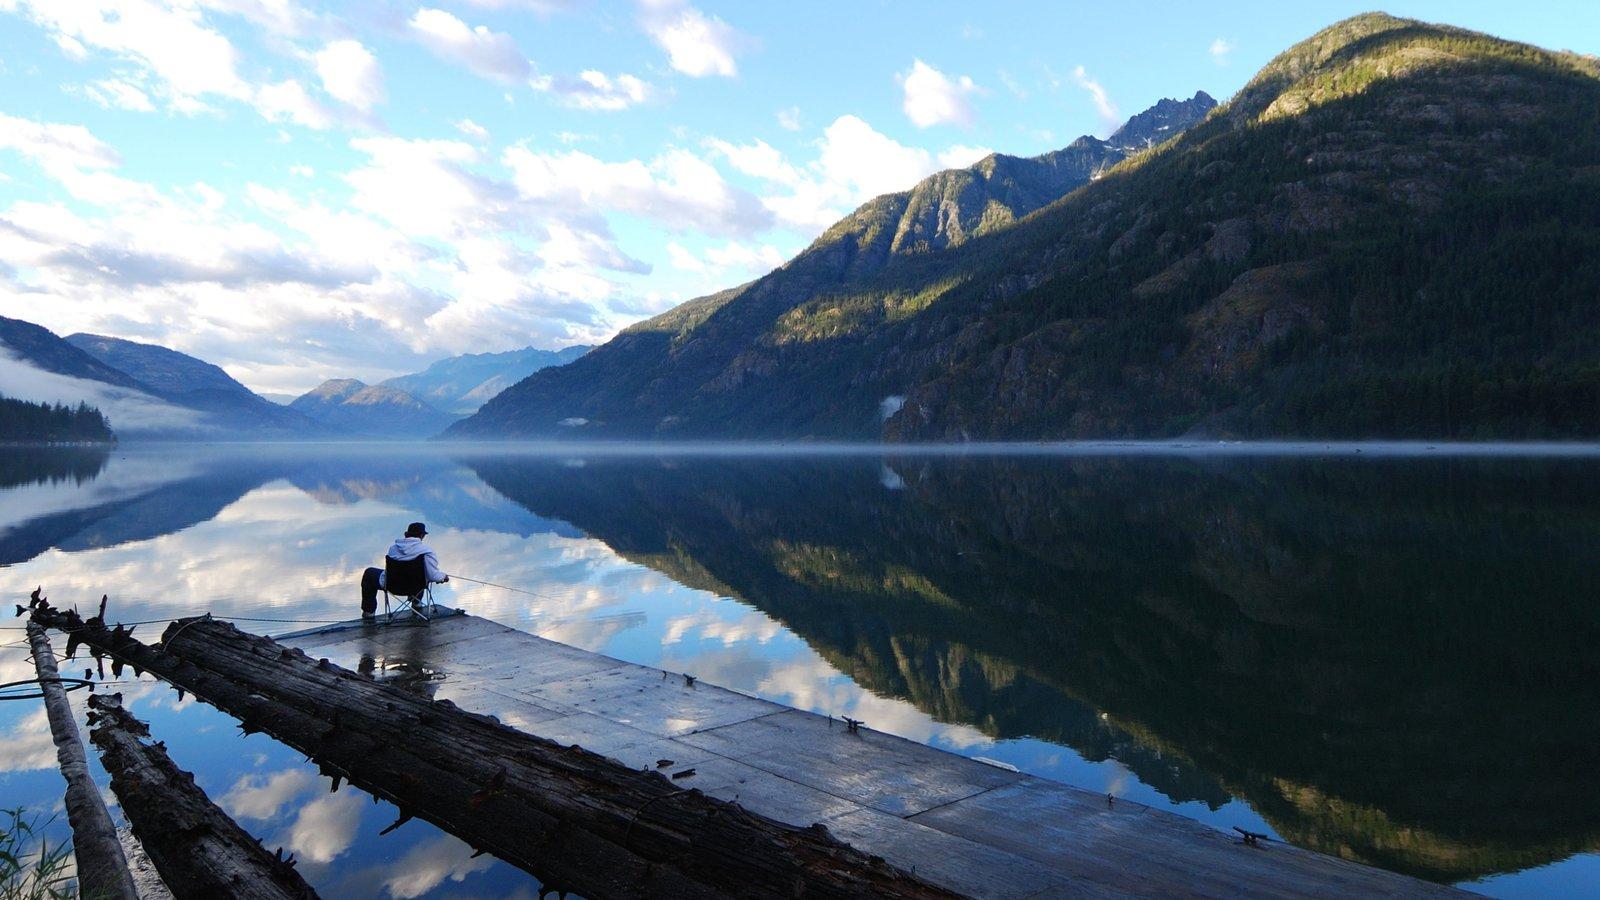 Chelan caracterizando montanhas e um lago ou charco